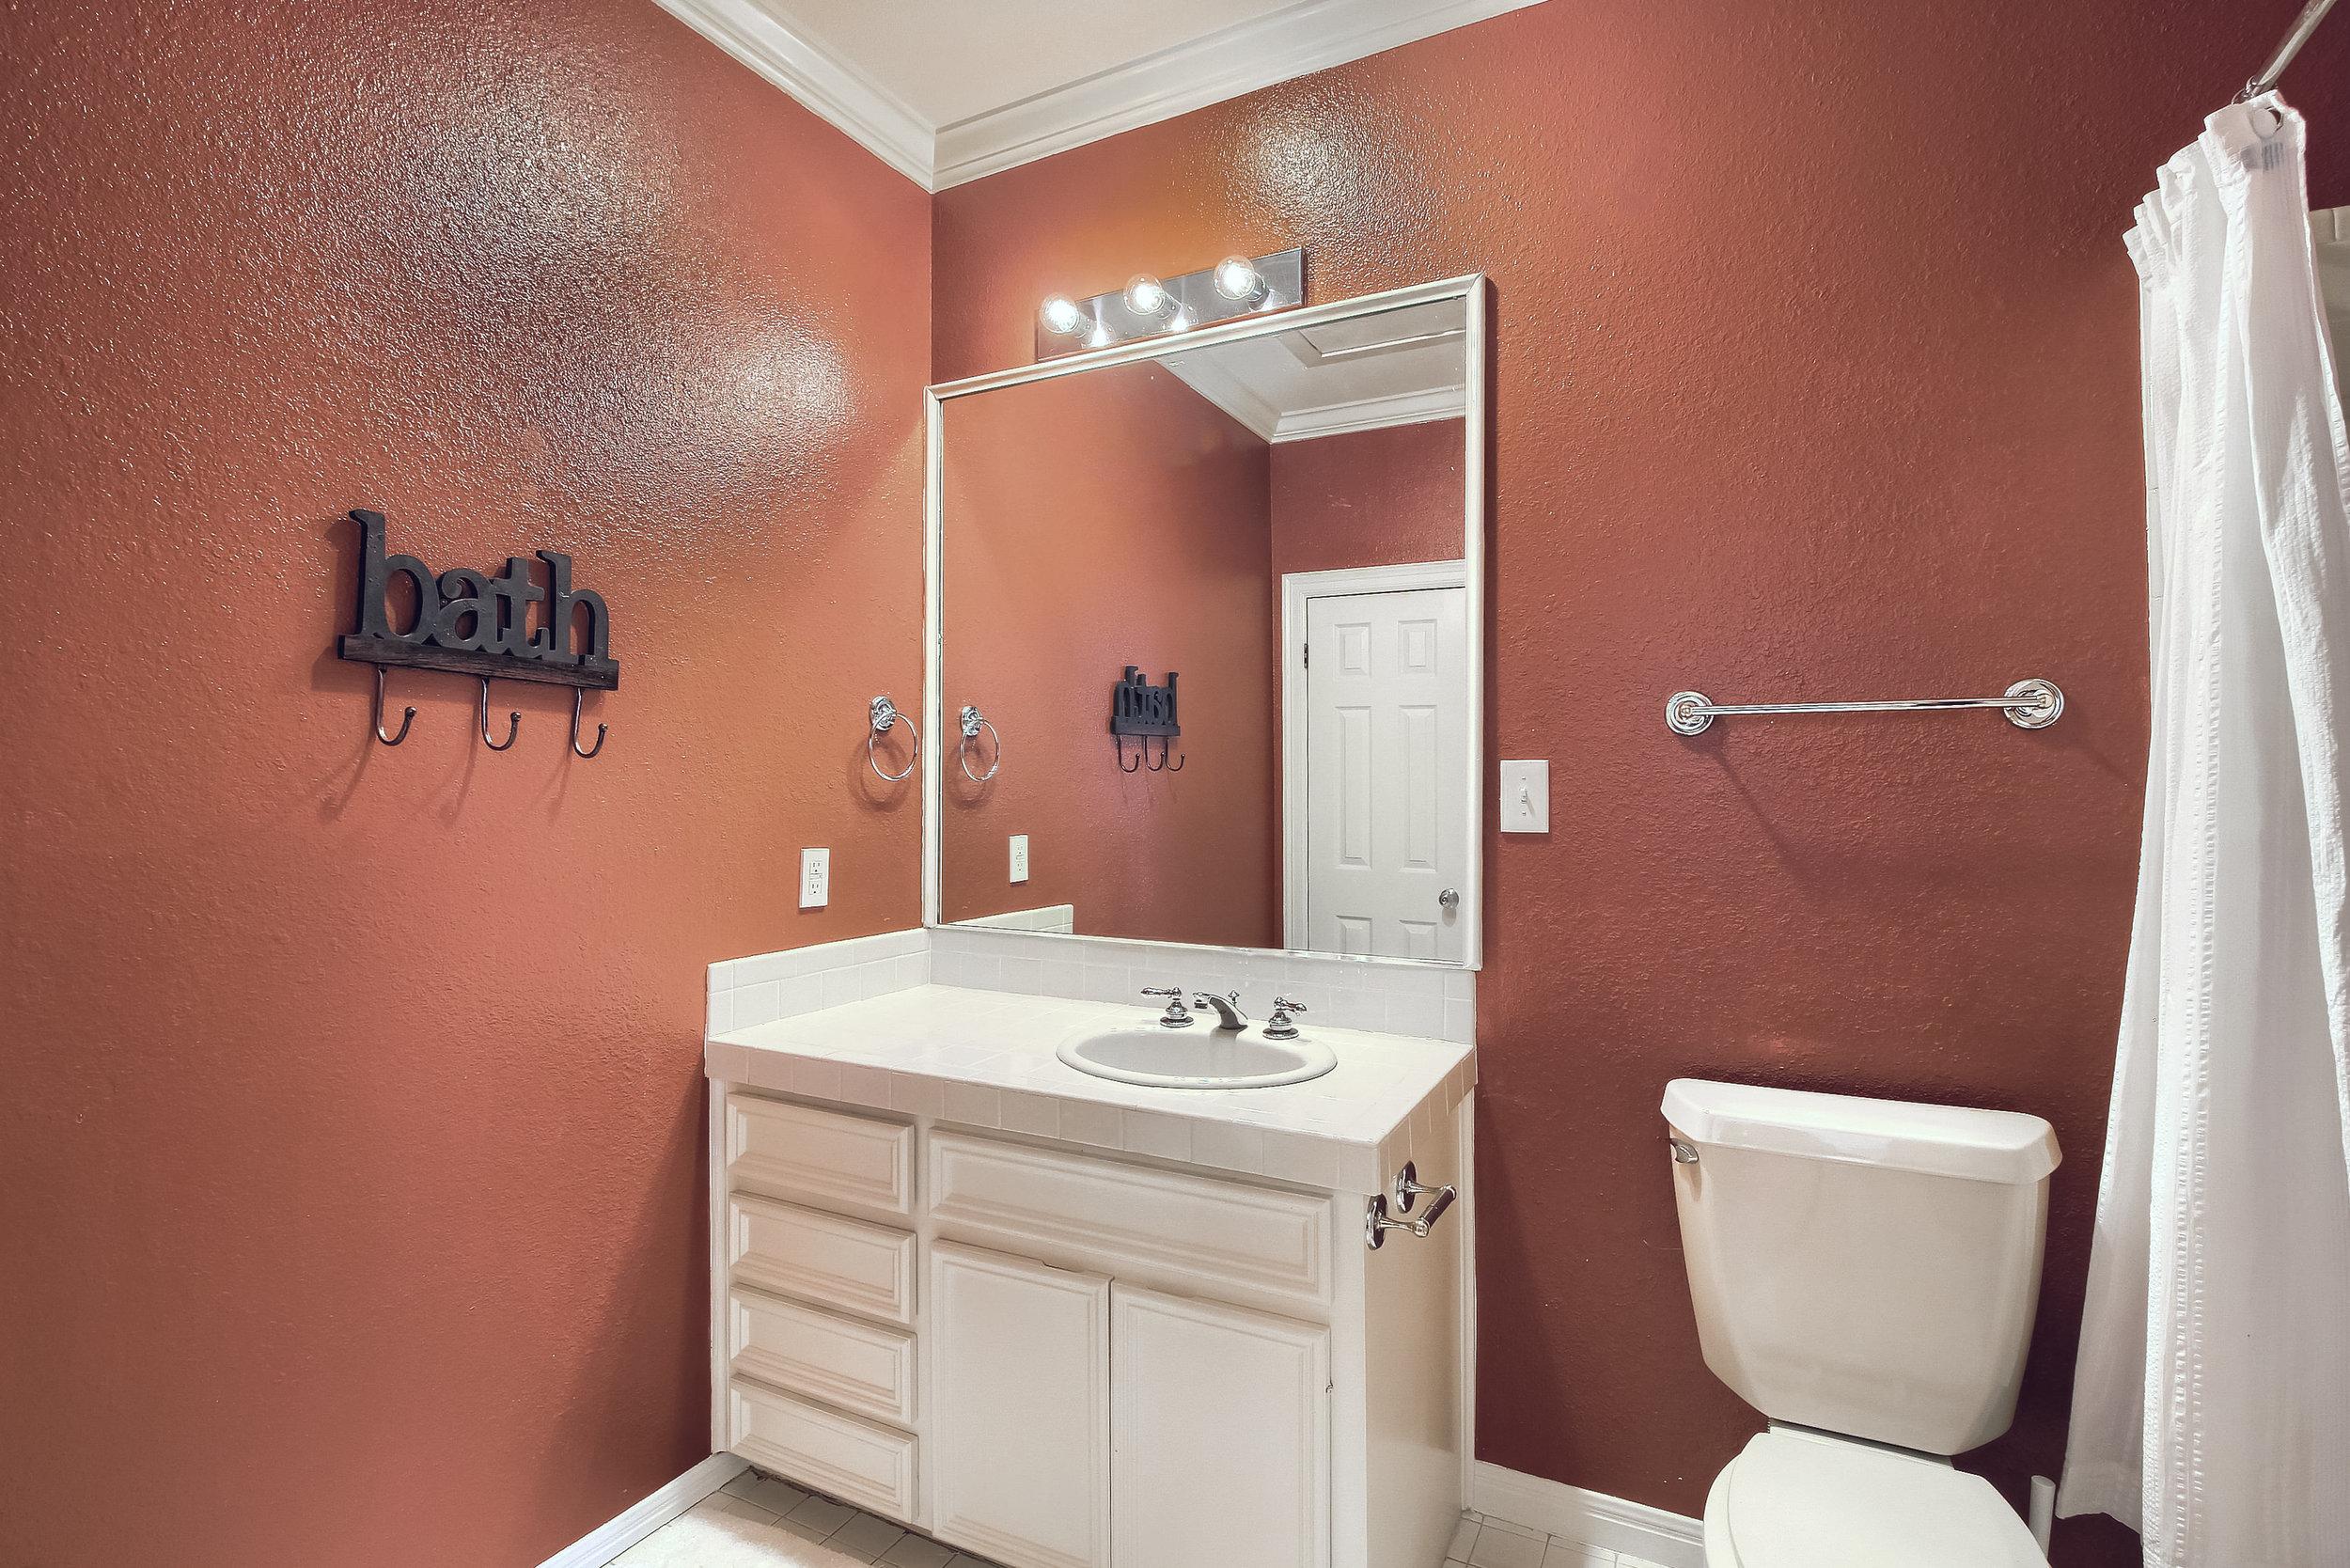 07_Bathroom_IMG_0232.JPG